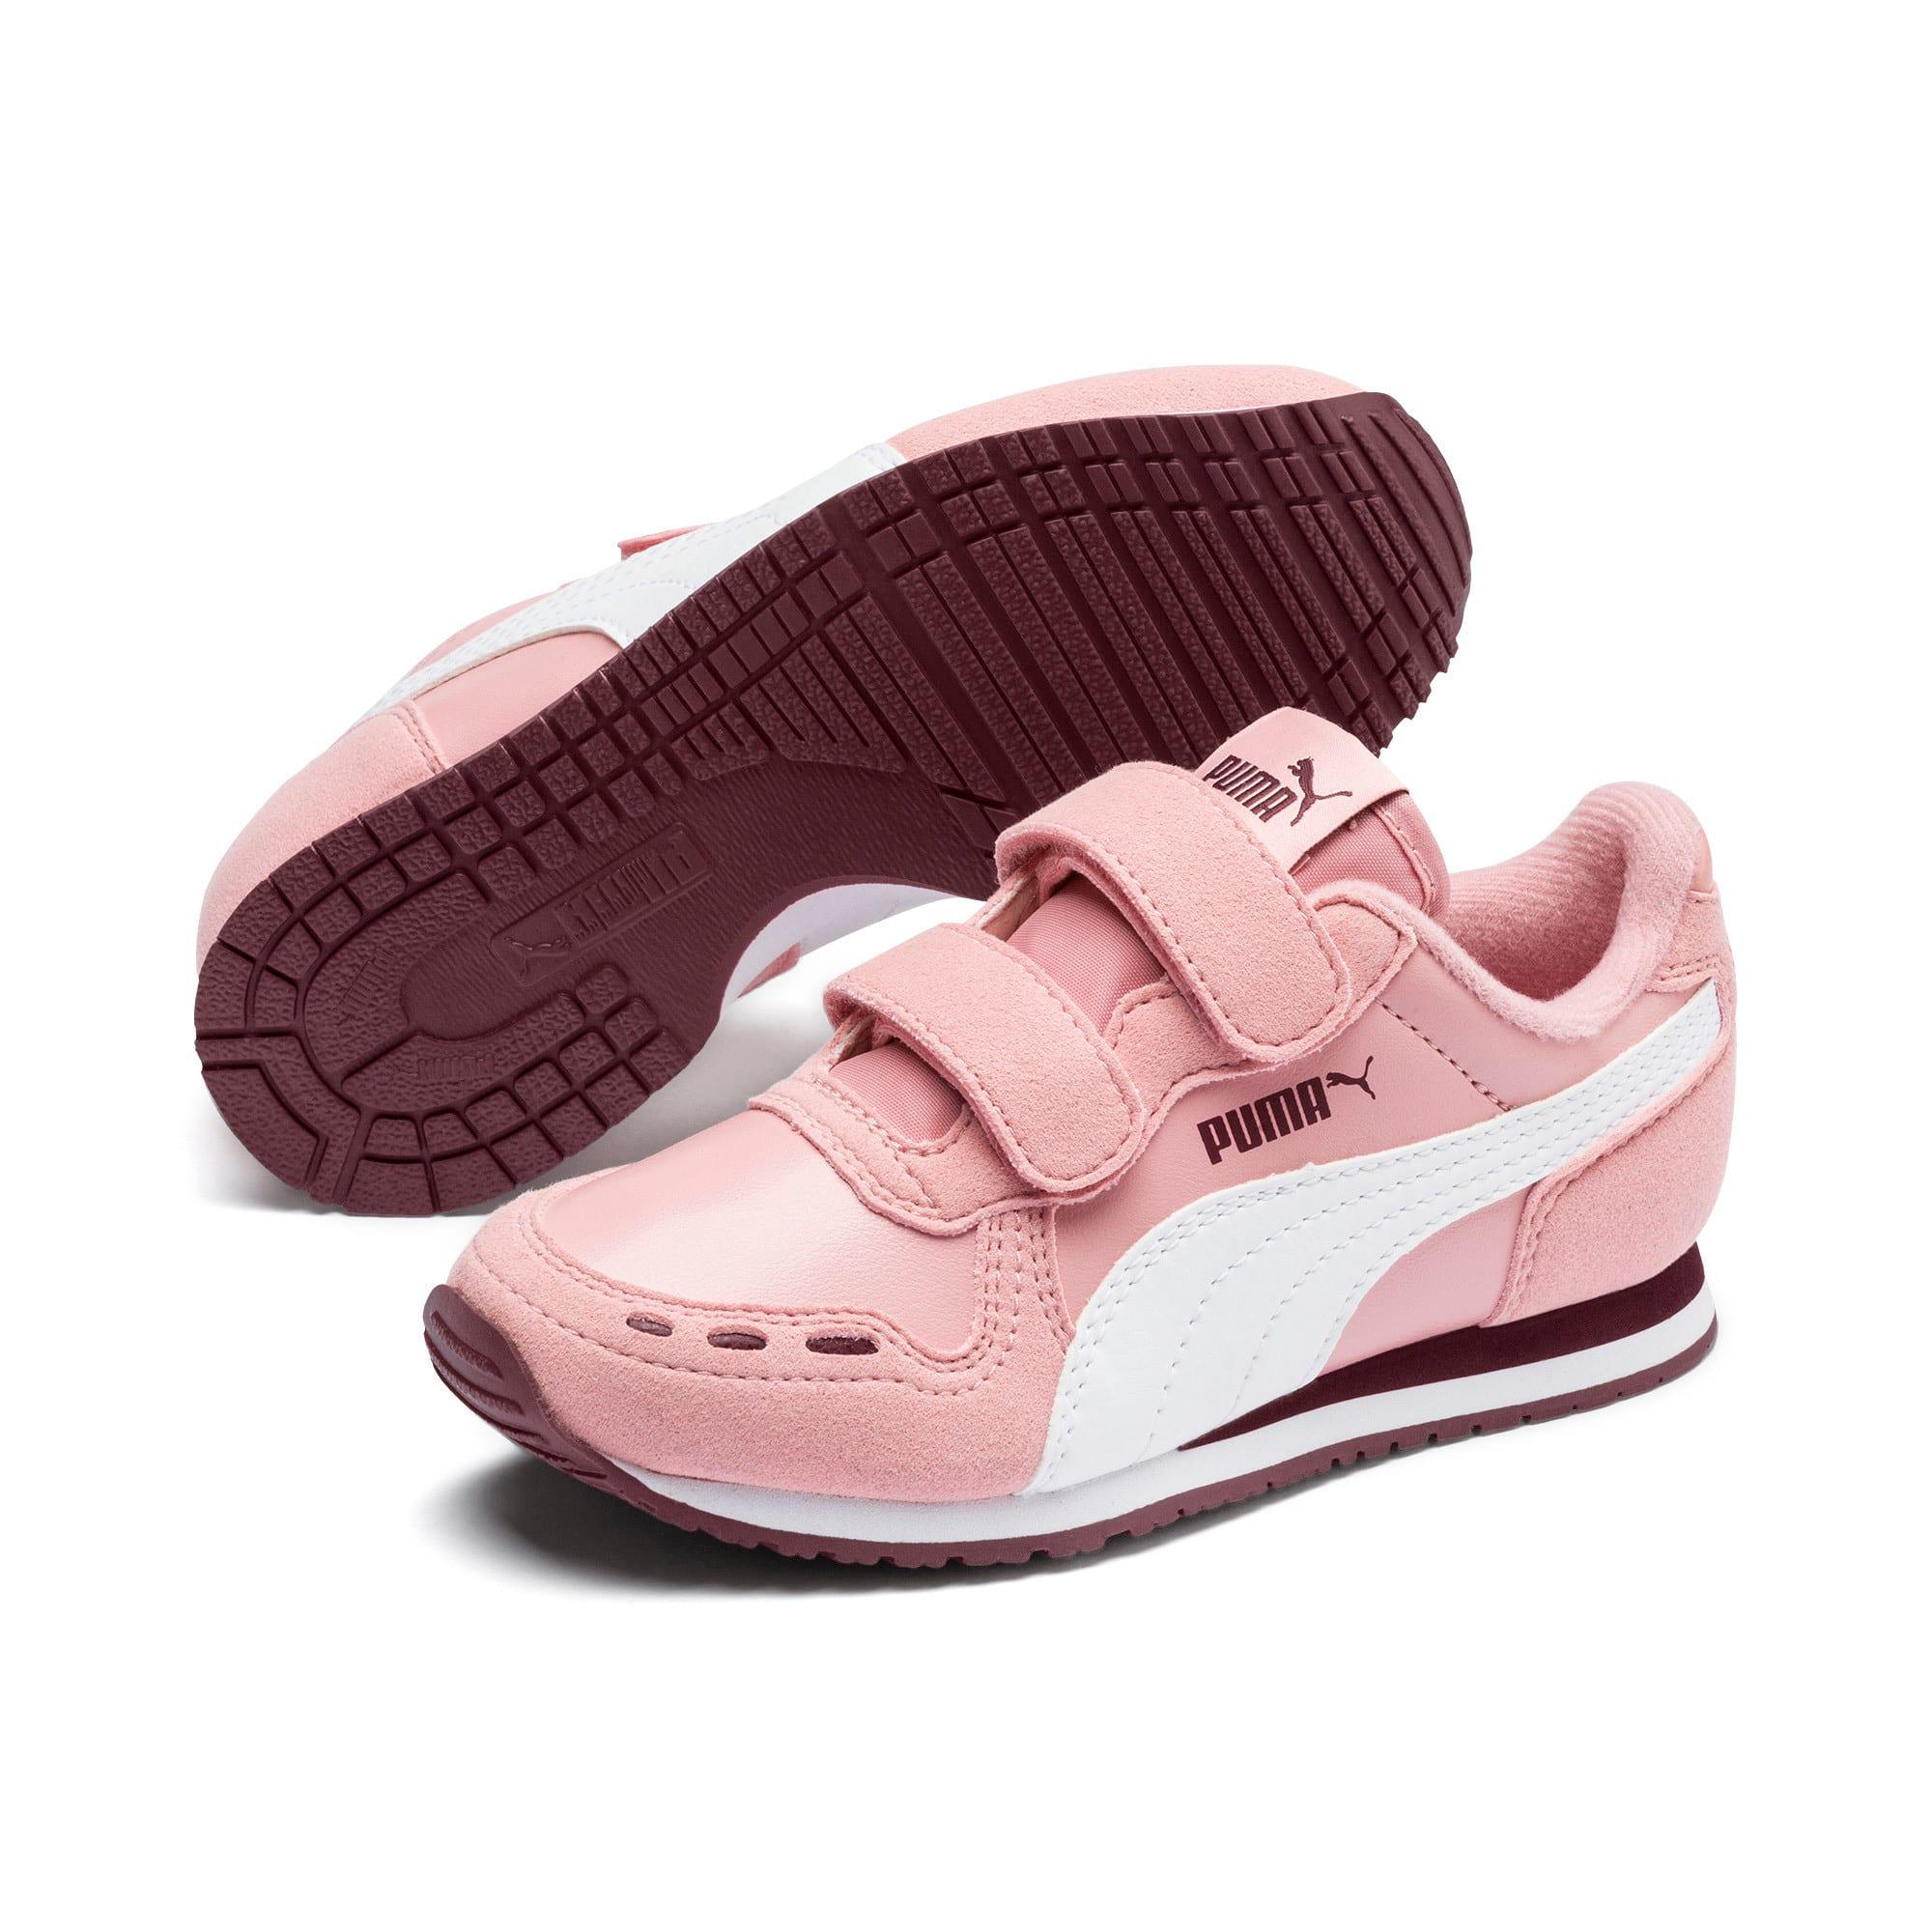 Thumbnail 2 of Cabana Racer SL V PS Baby Sneaker, Bridal Rose-Puma White, medium